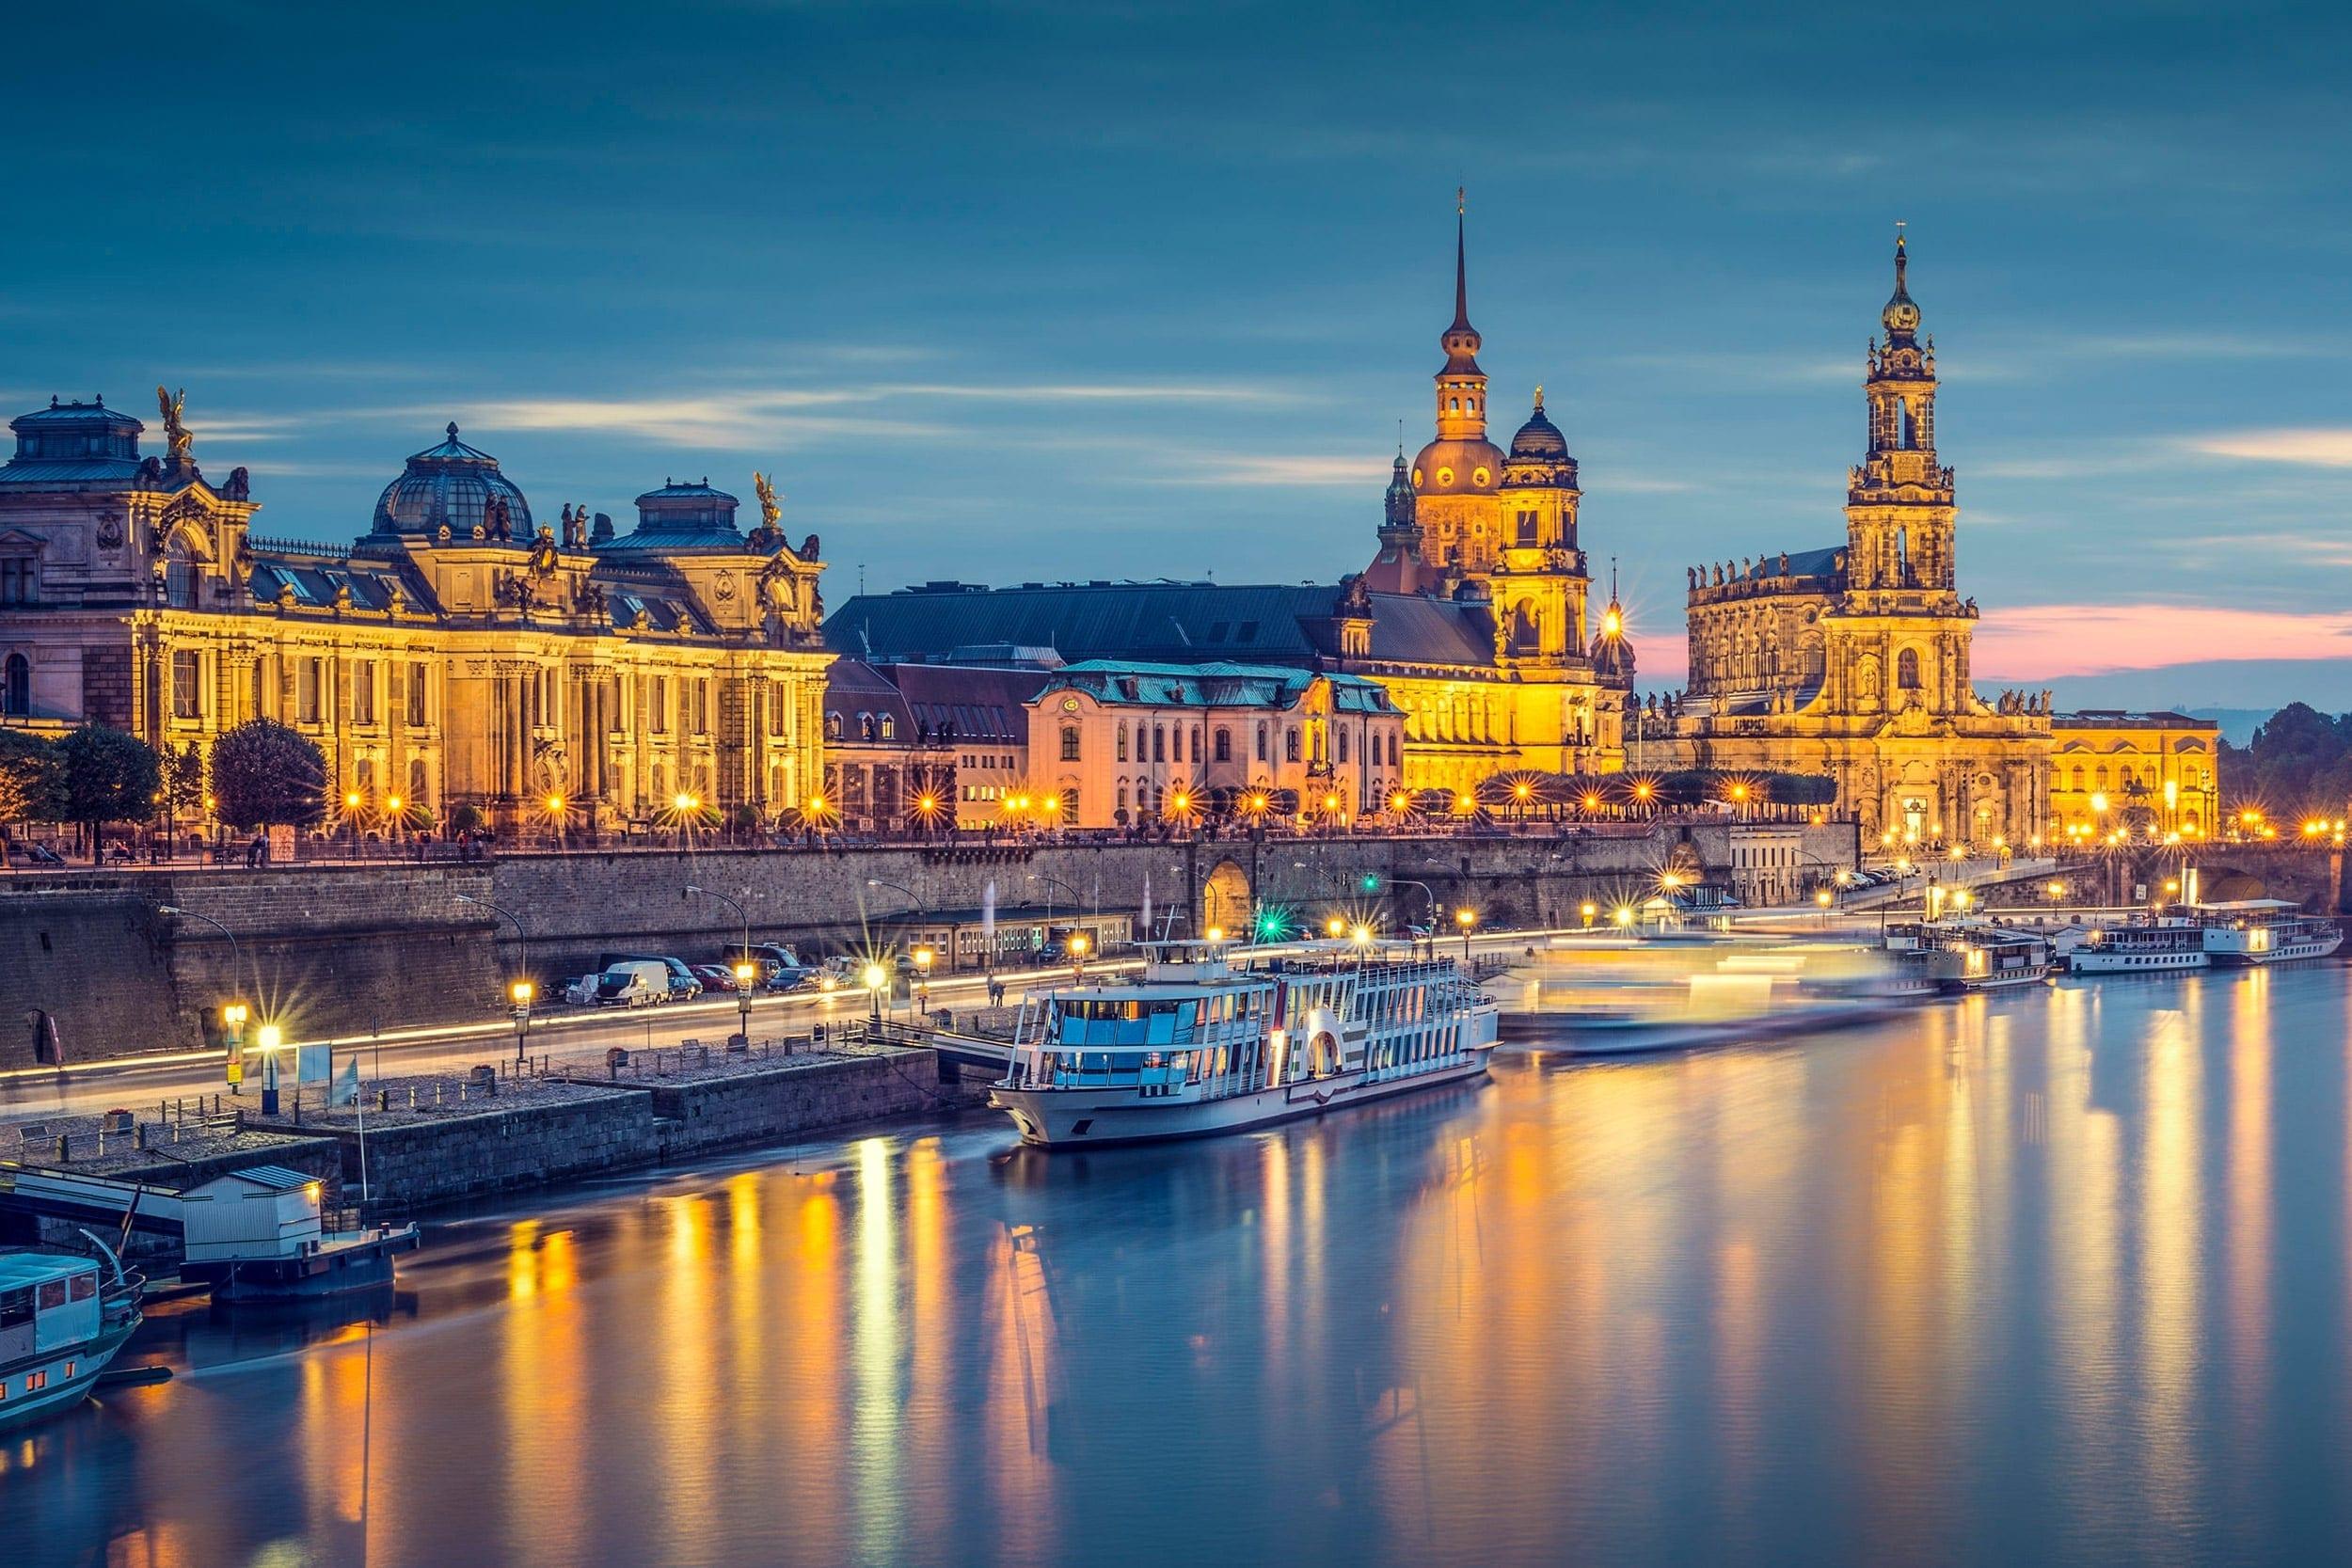 Mooiste steden van Duitsland